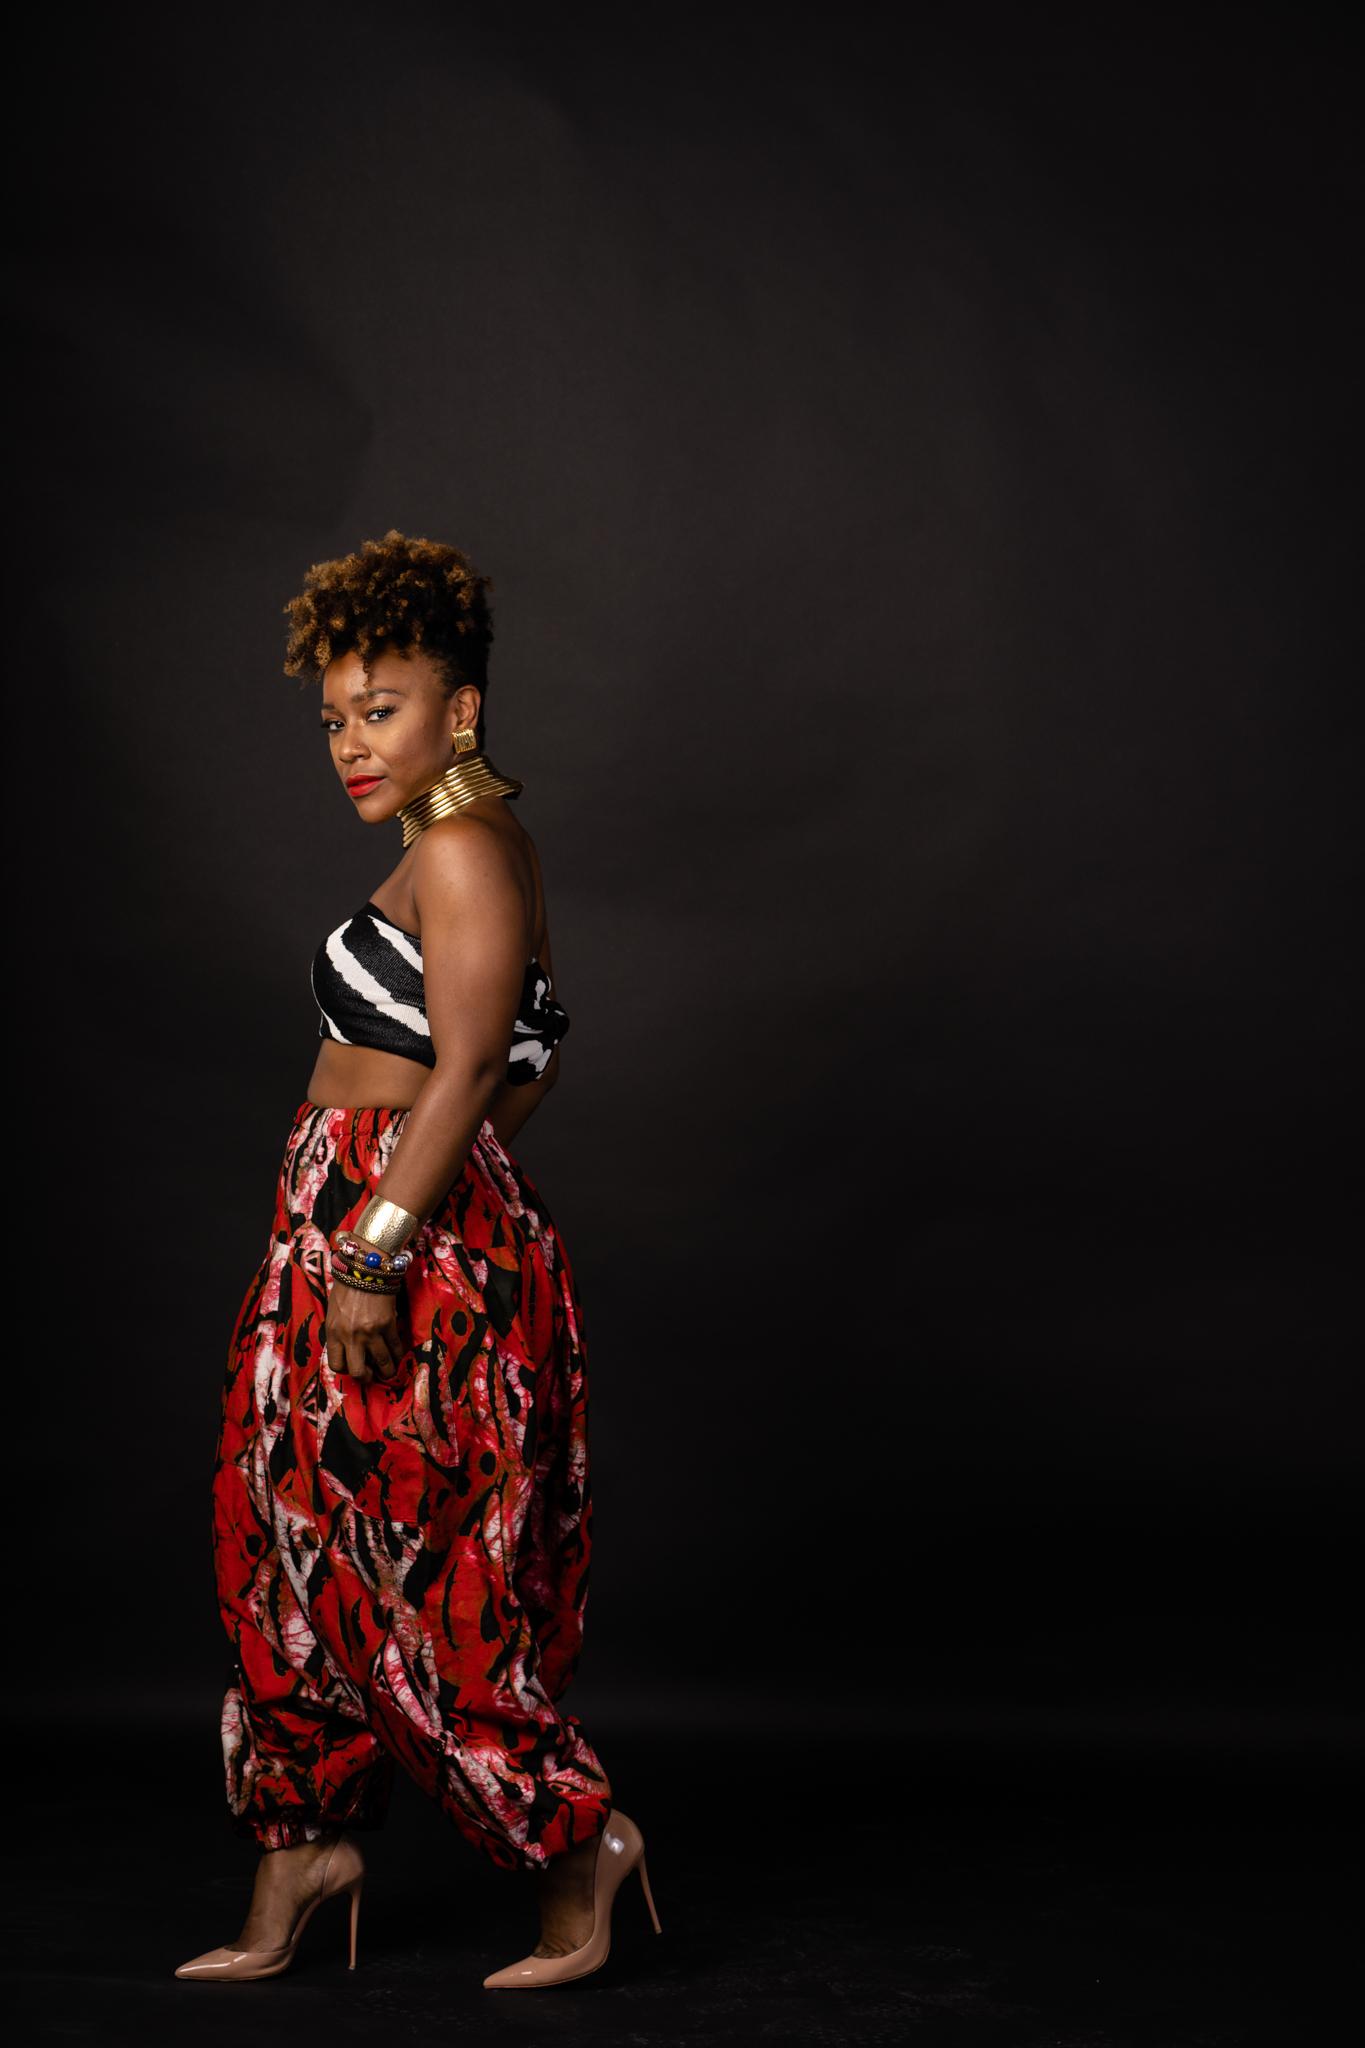 black woman model